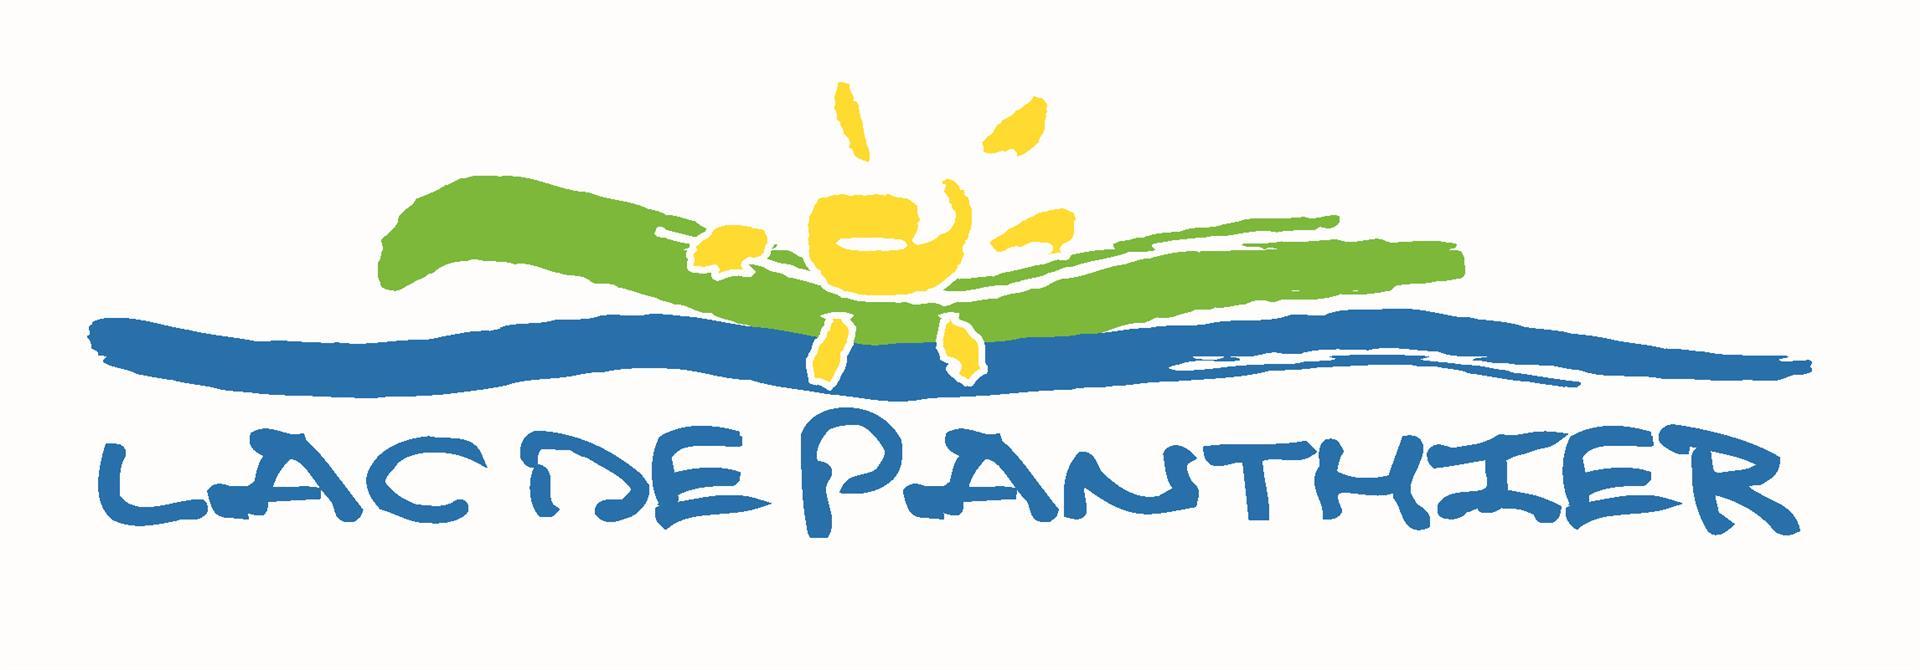 logo panthier HD - Lac de Panthier